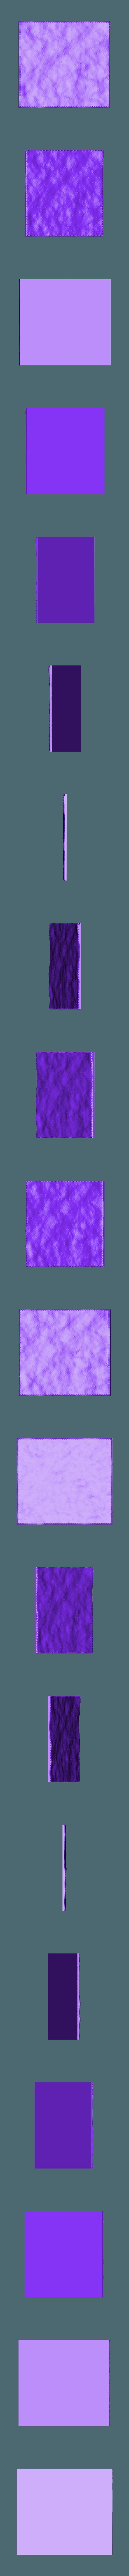 ant_base_Rough_ground.stl Download free STL file Base for Ant Walker Scifi gaming 28mm • 3D printable design, redstarkits